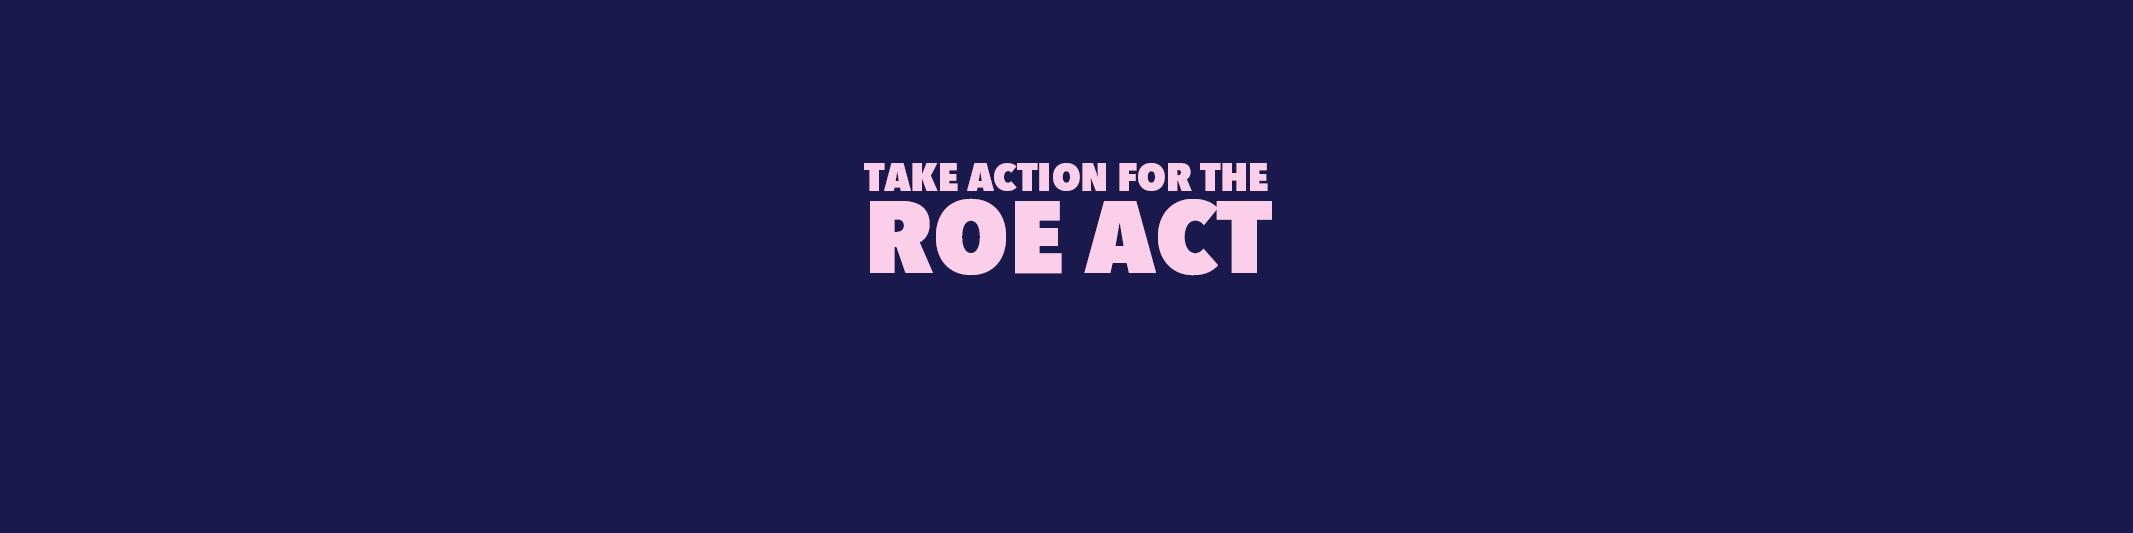 Roe_coalition_googleformheader_v1